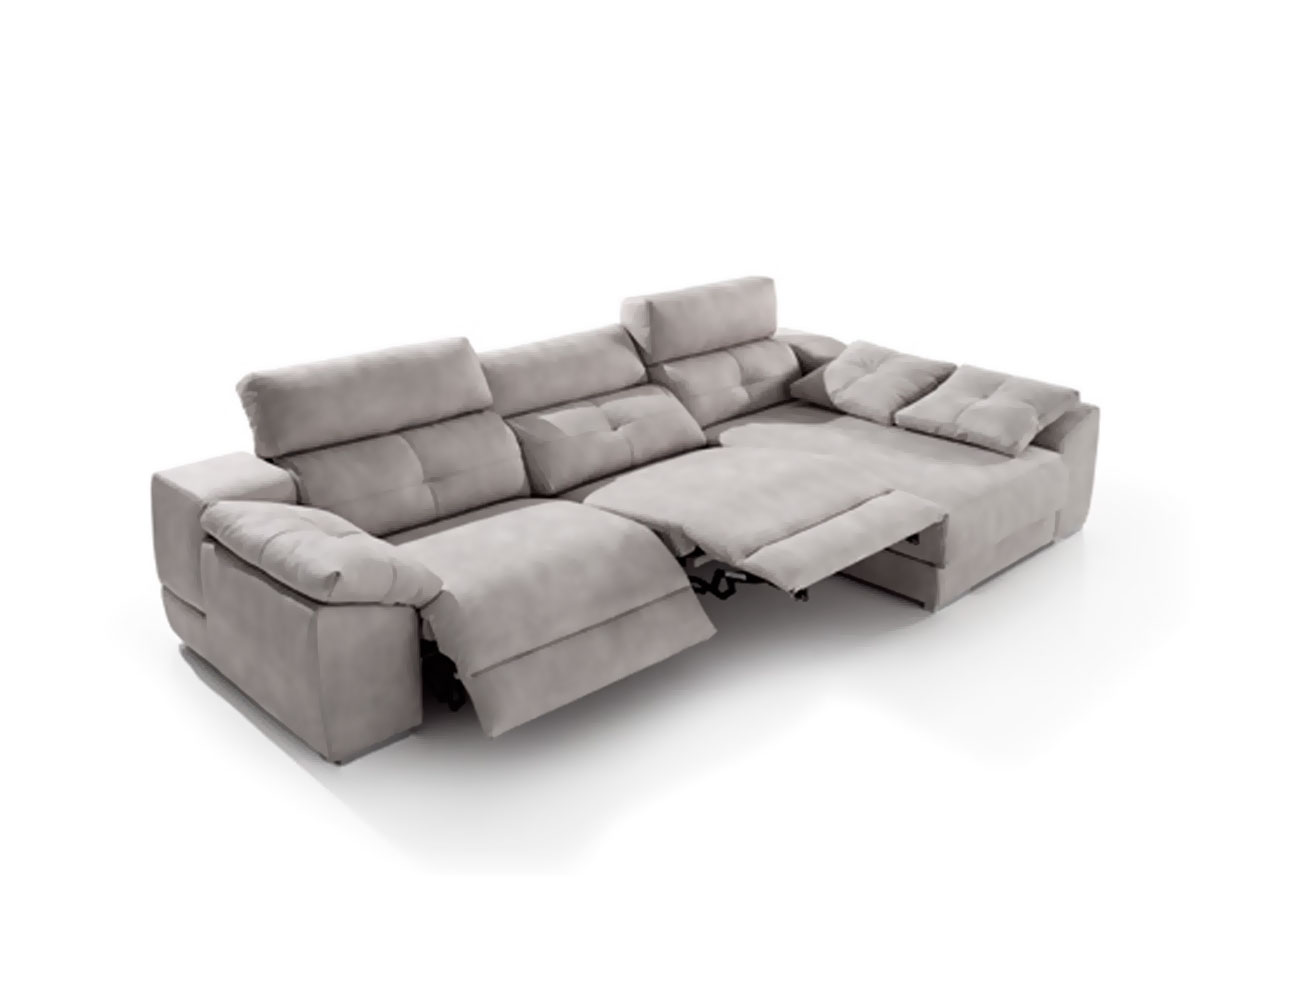 Sofa chaiselongue relax motor acomodel arcon detalle